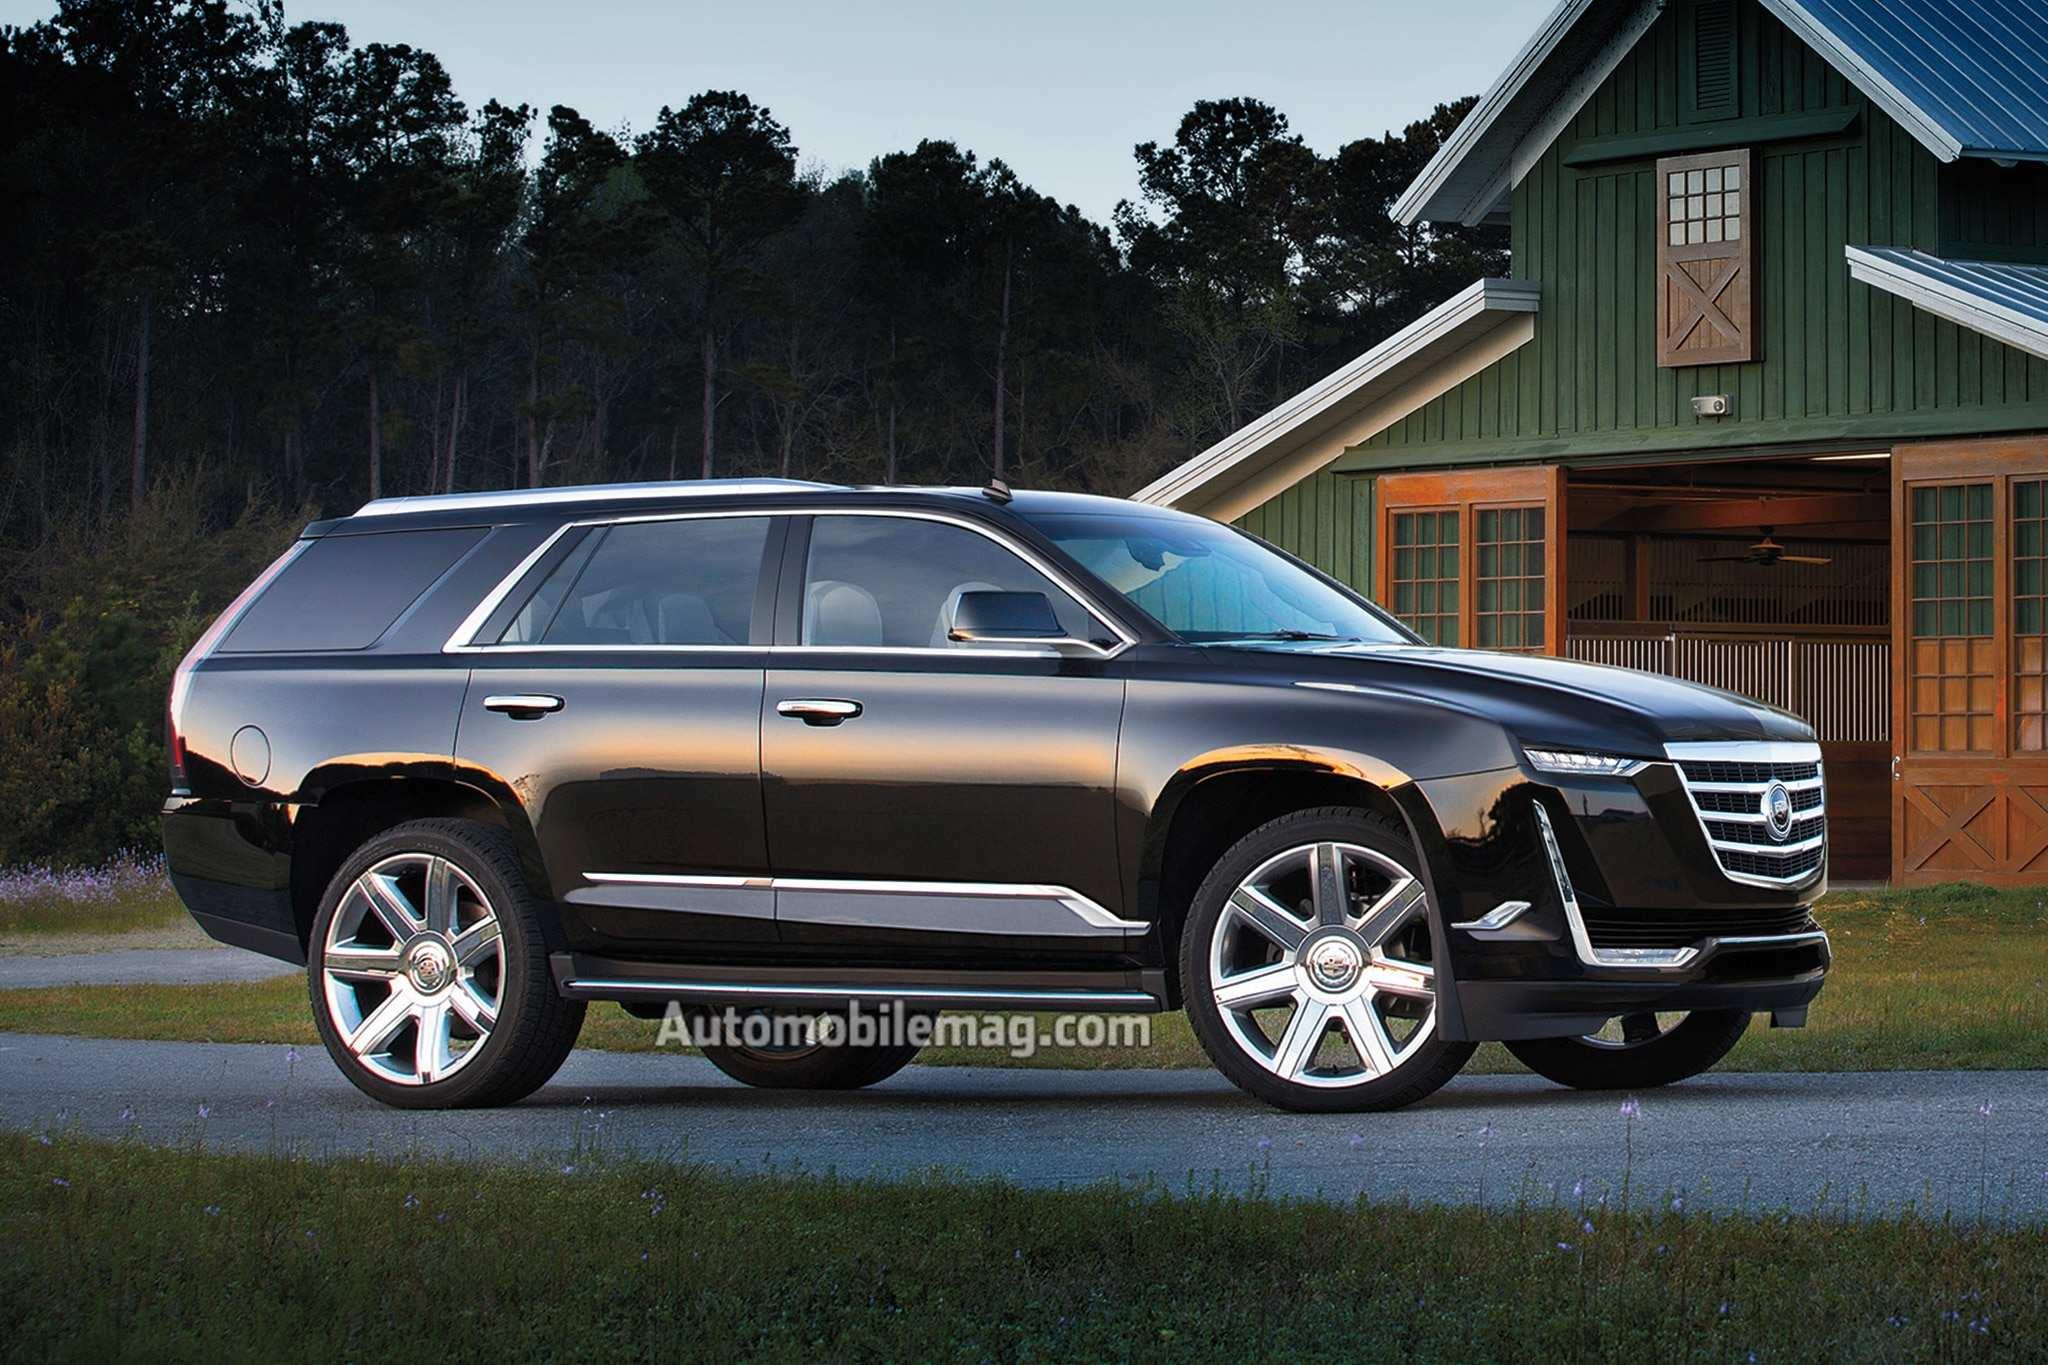 37 New New 2020 Cadillac Escalade Ratings by New 2020 Cadillac Escalade